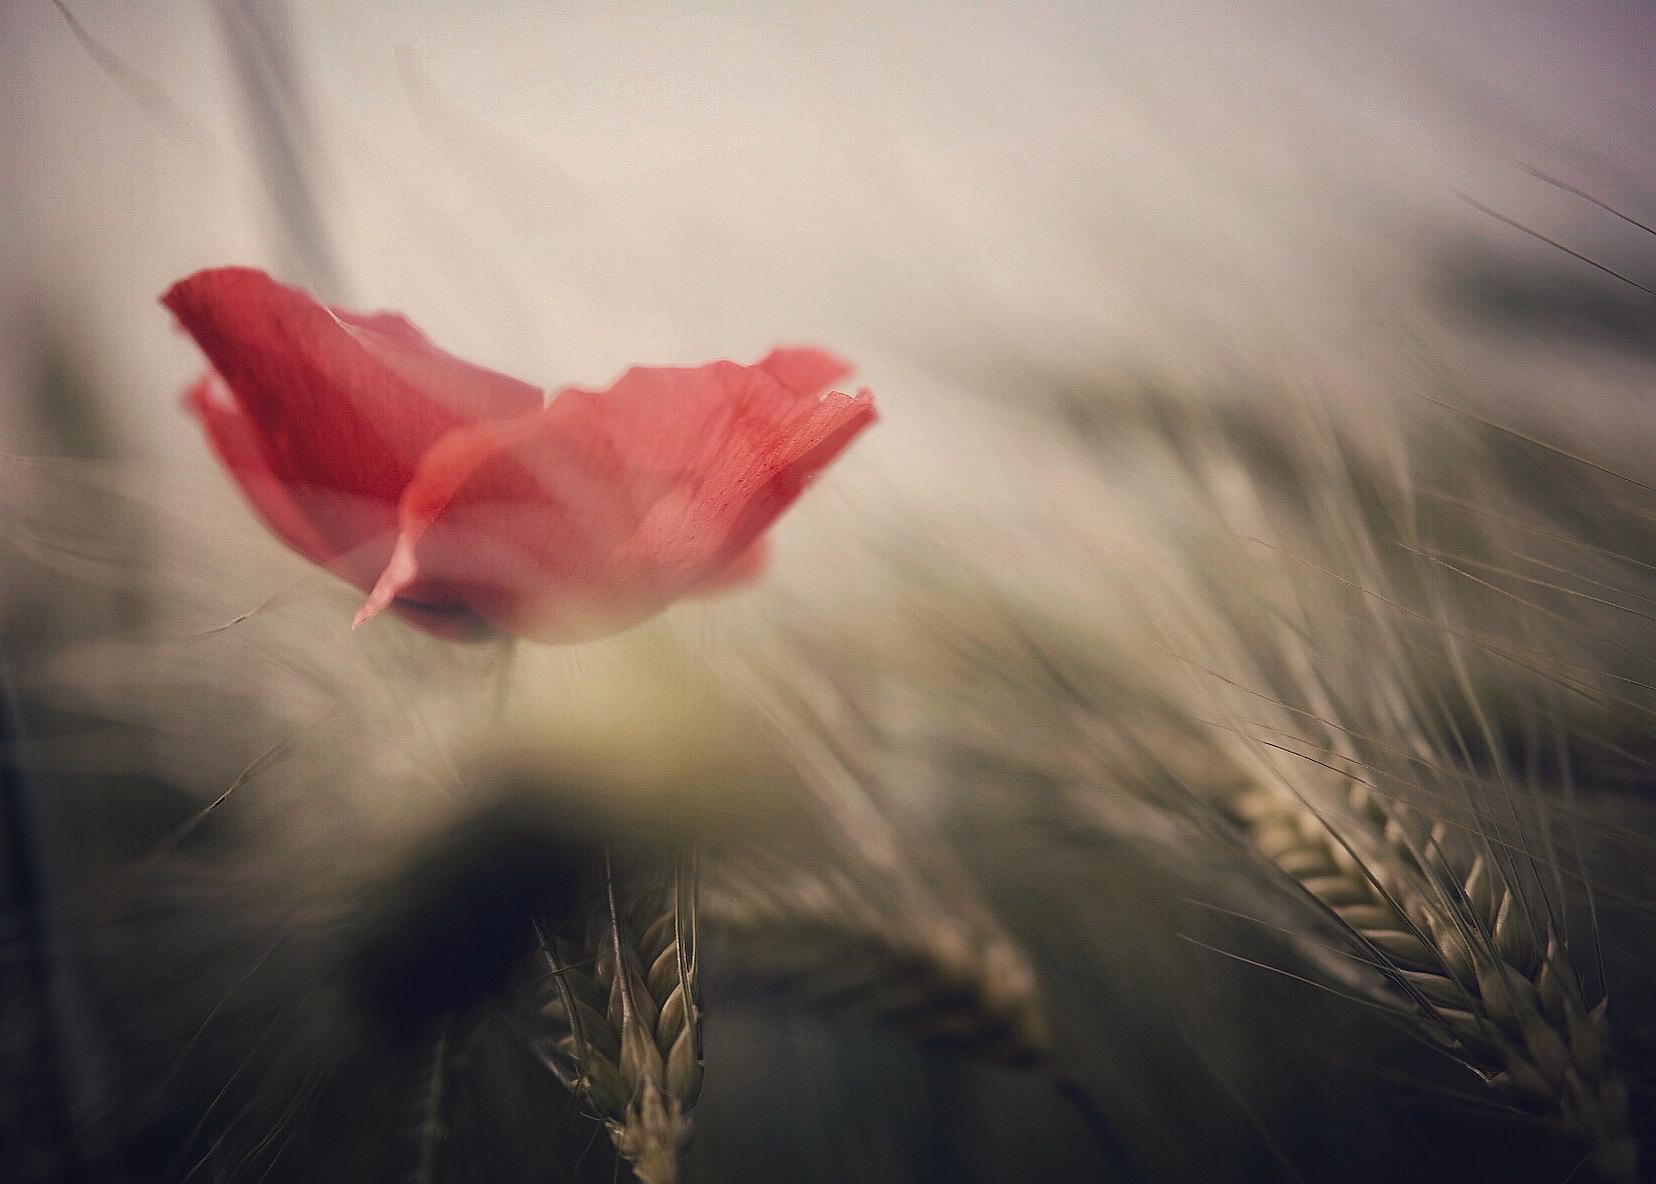 Повей,повей | Author sevenseconds | PHOTO FORUM